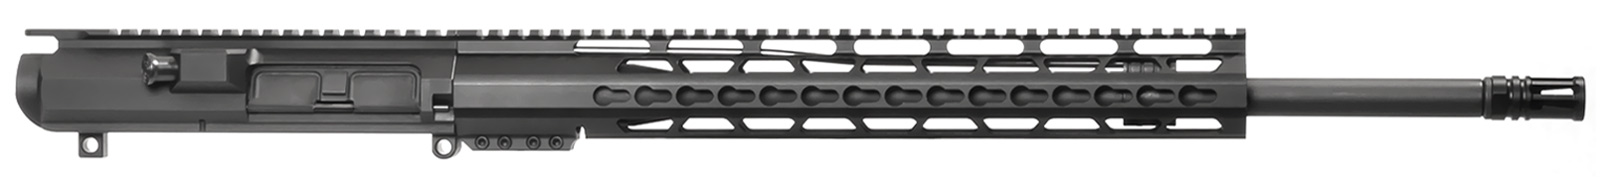 ar-10-upper-assembly-20-308-win-110-15-cbc-industries-keymod-ar-10-handguard-rail